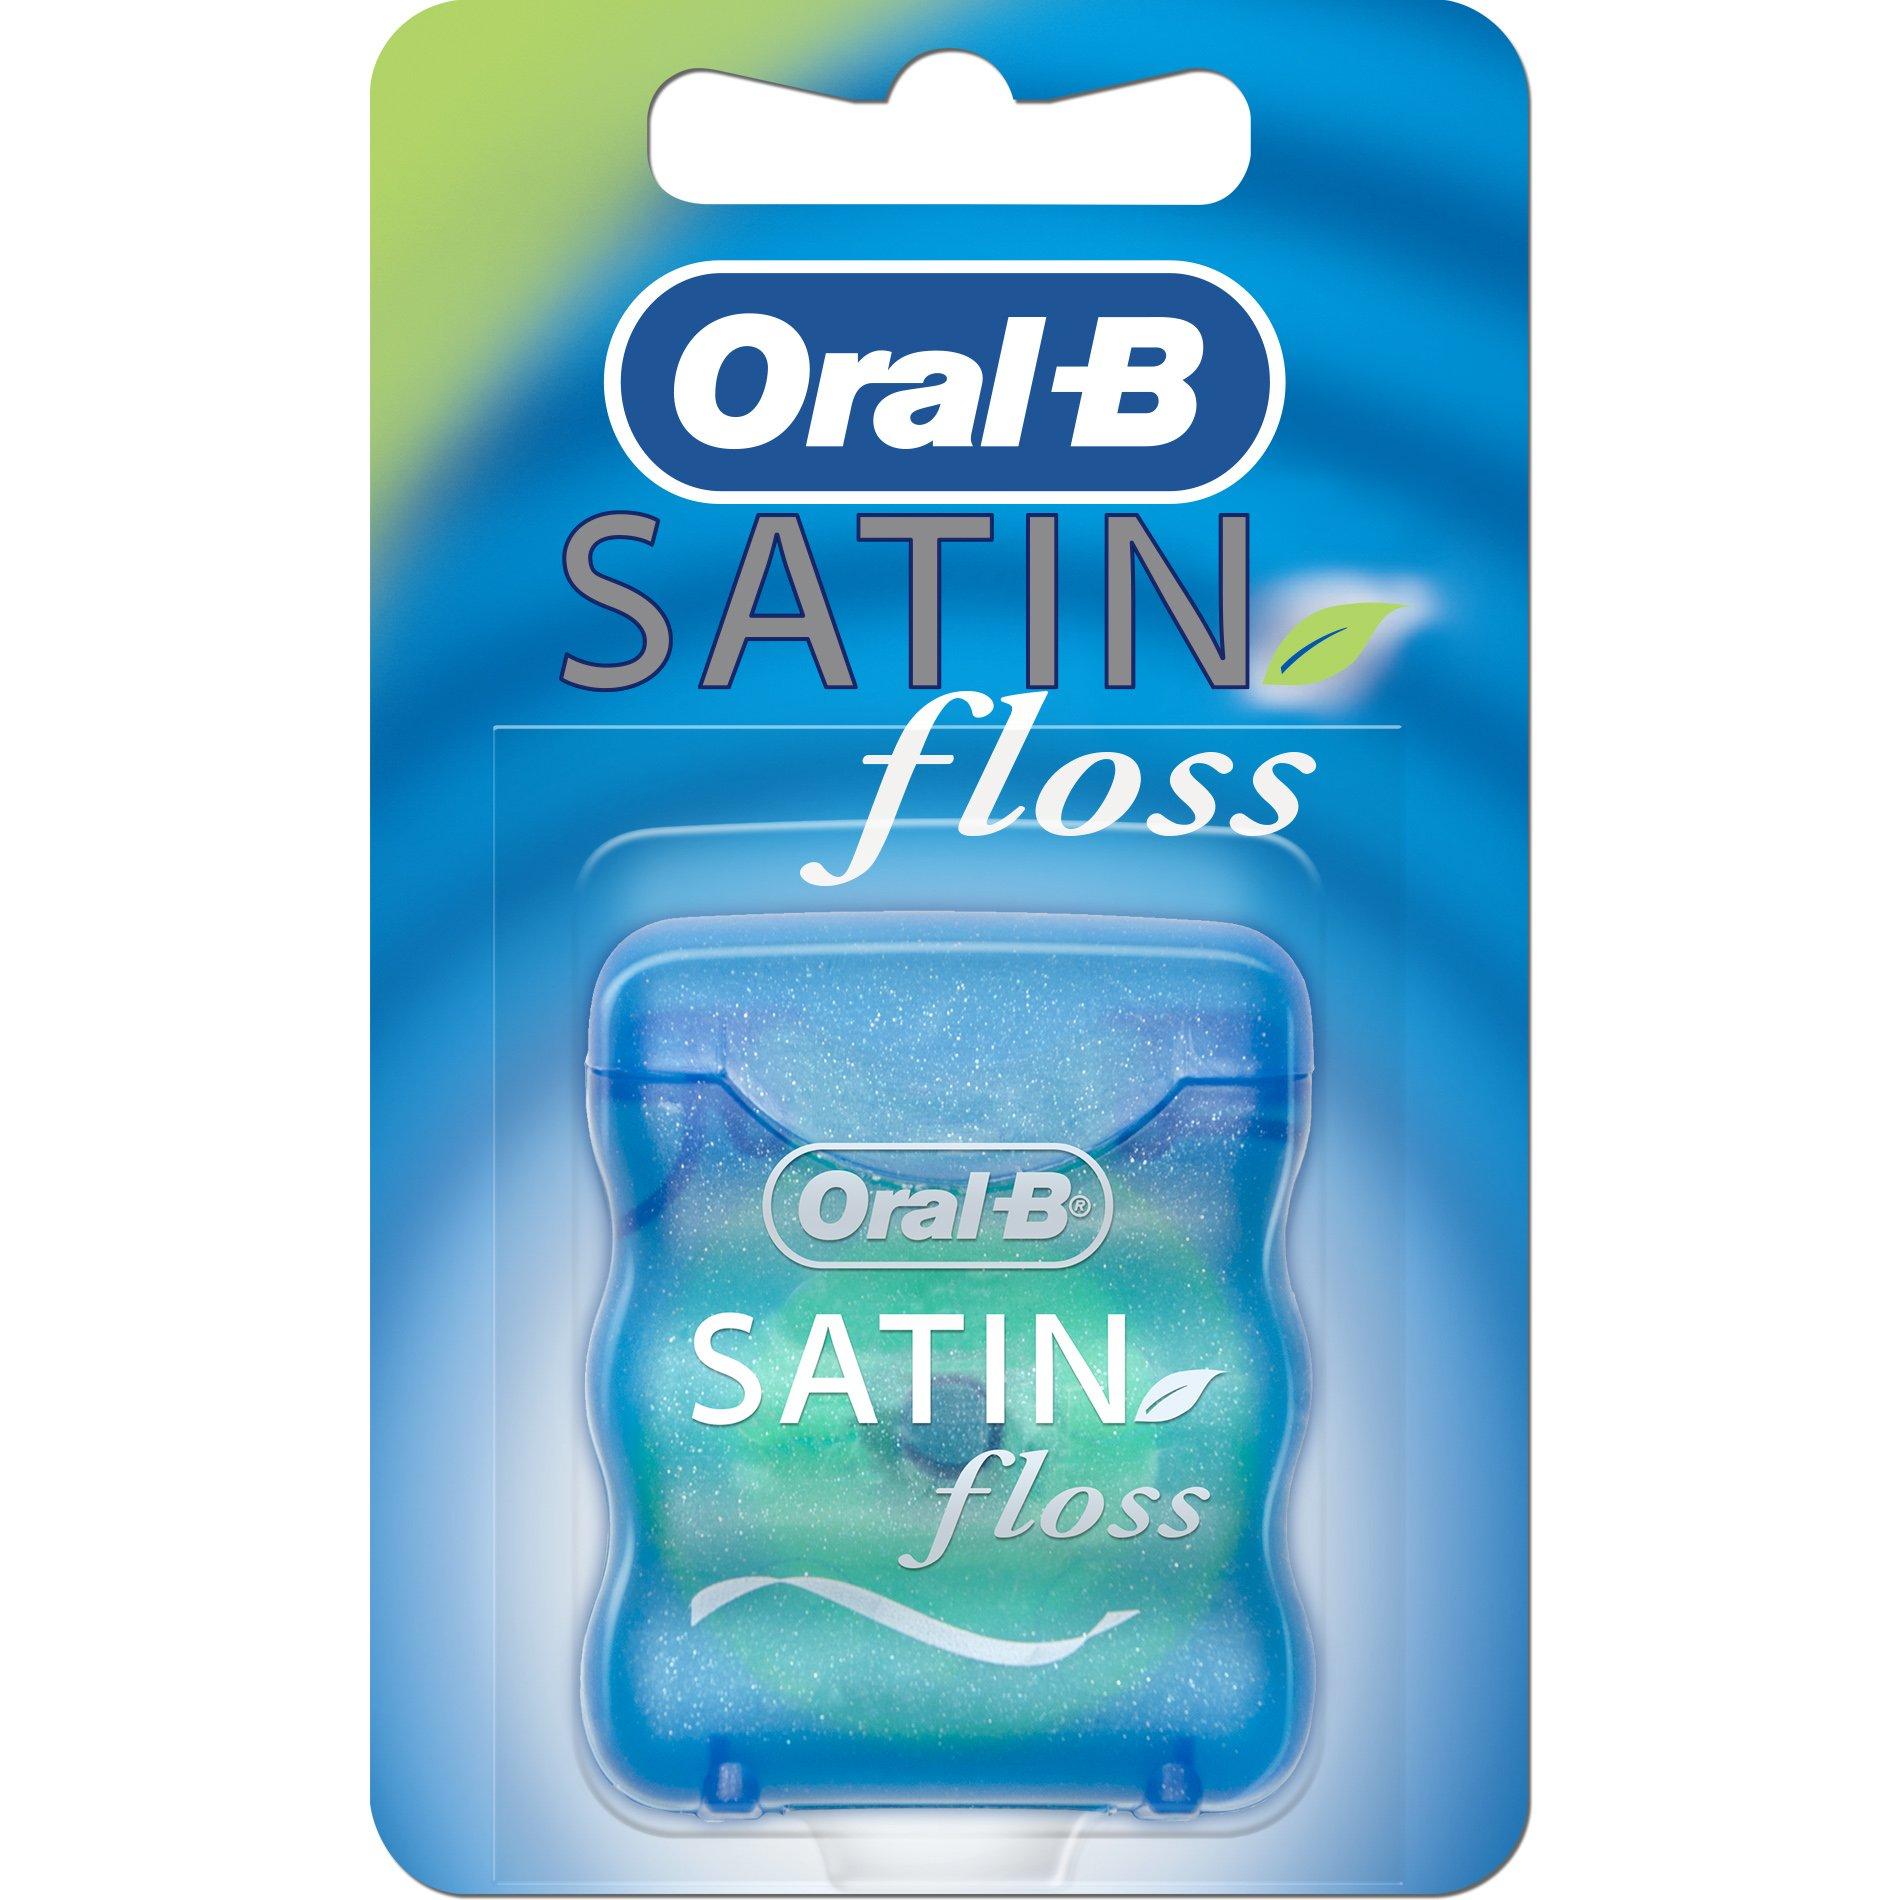 Oral-B Satin Floss Οδοντικό Νήμα 25m